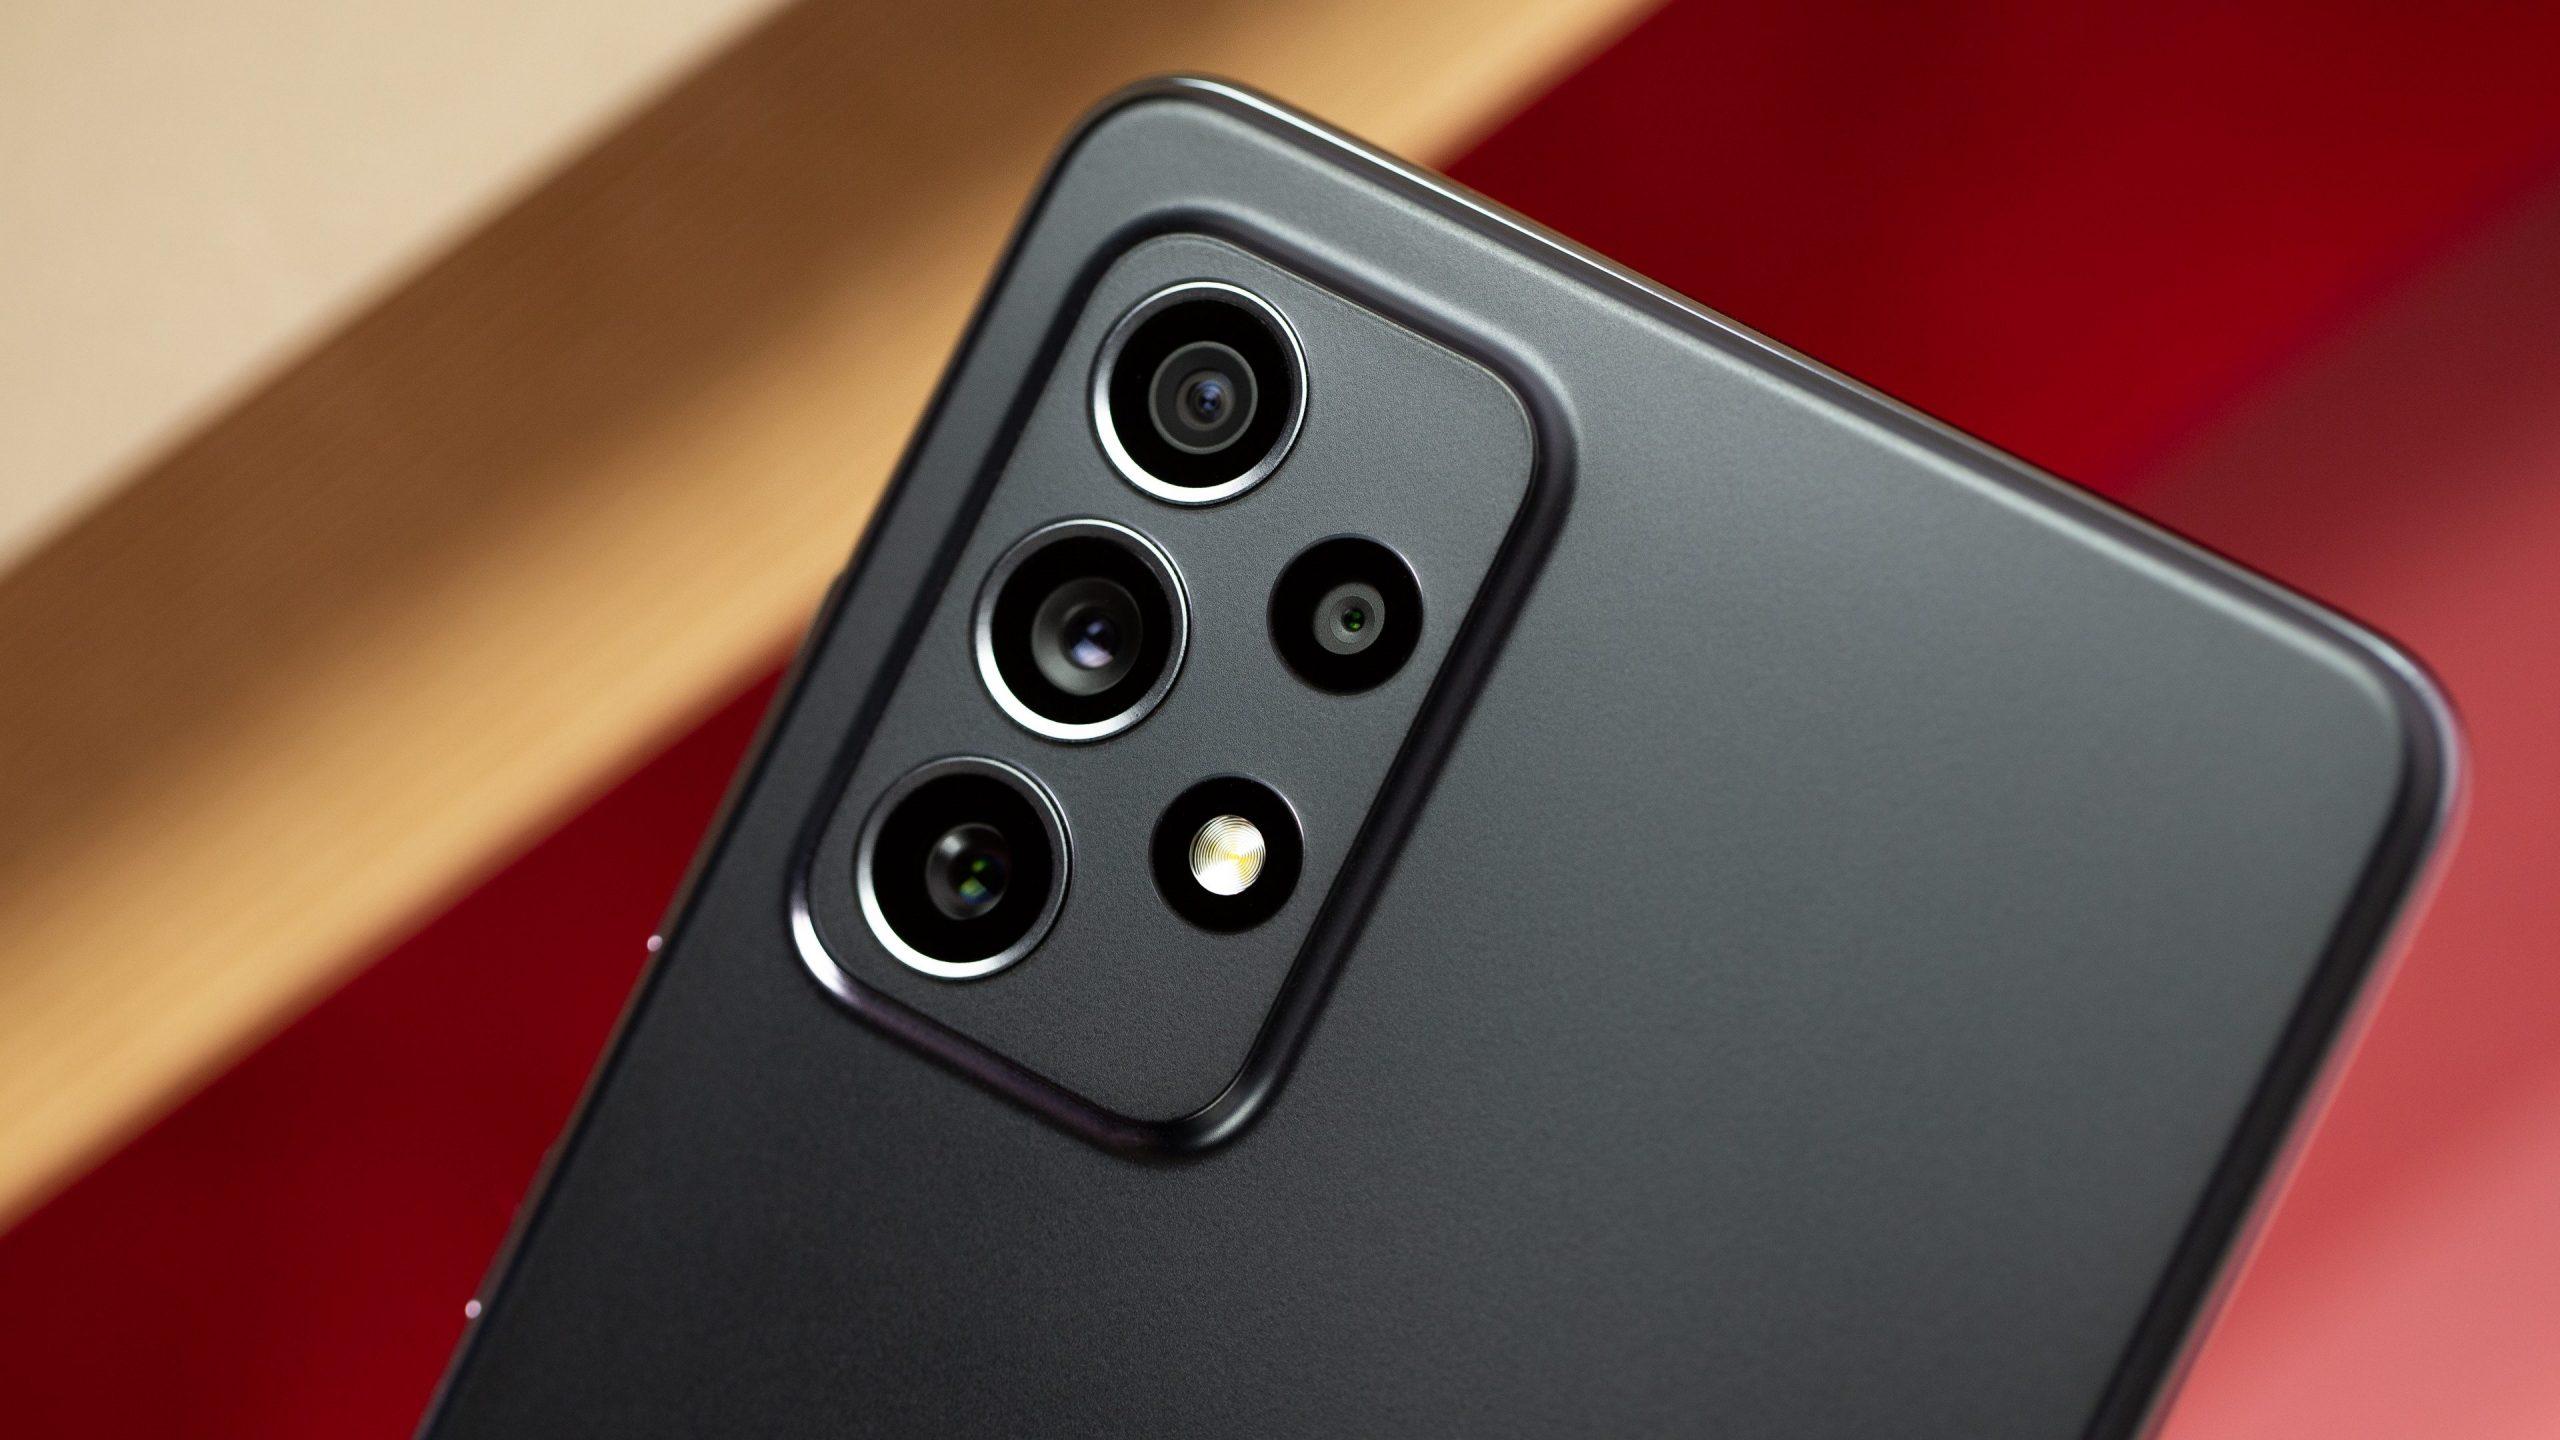 NextPit Samgung Galaxy A72 camera scaled